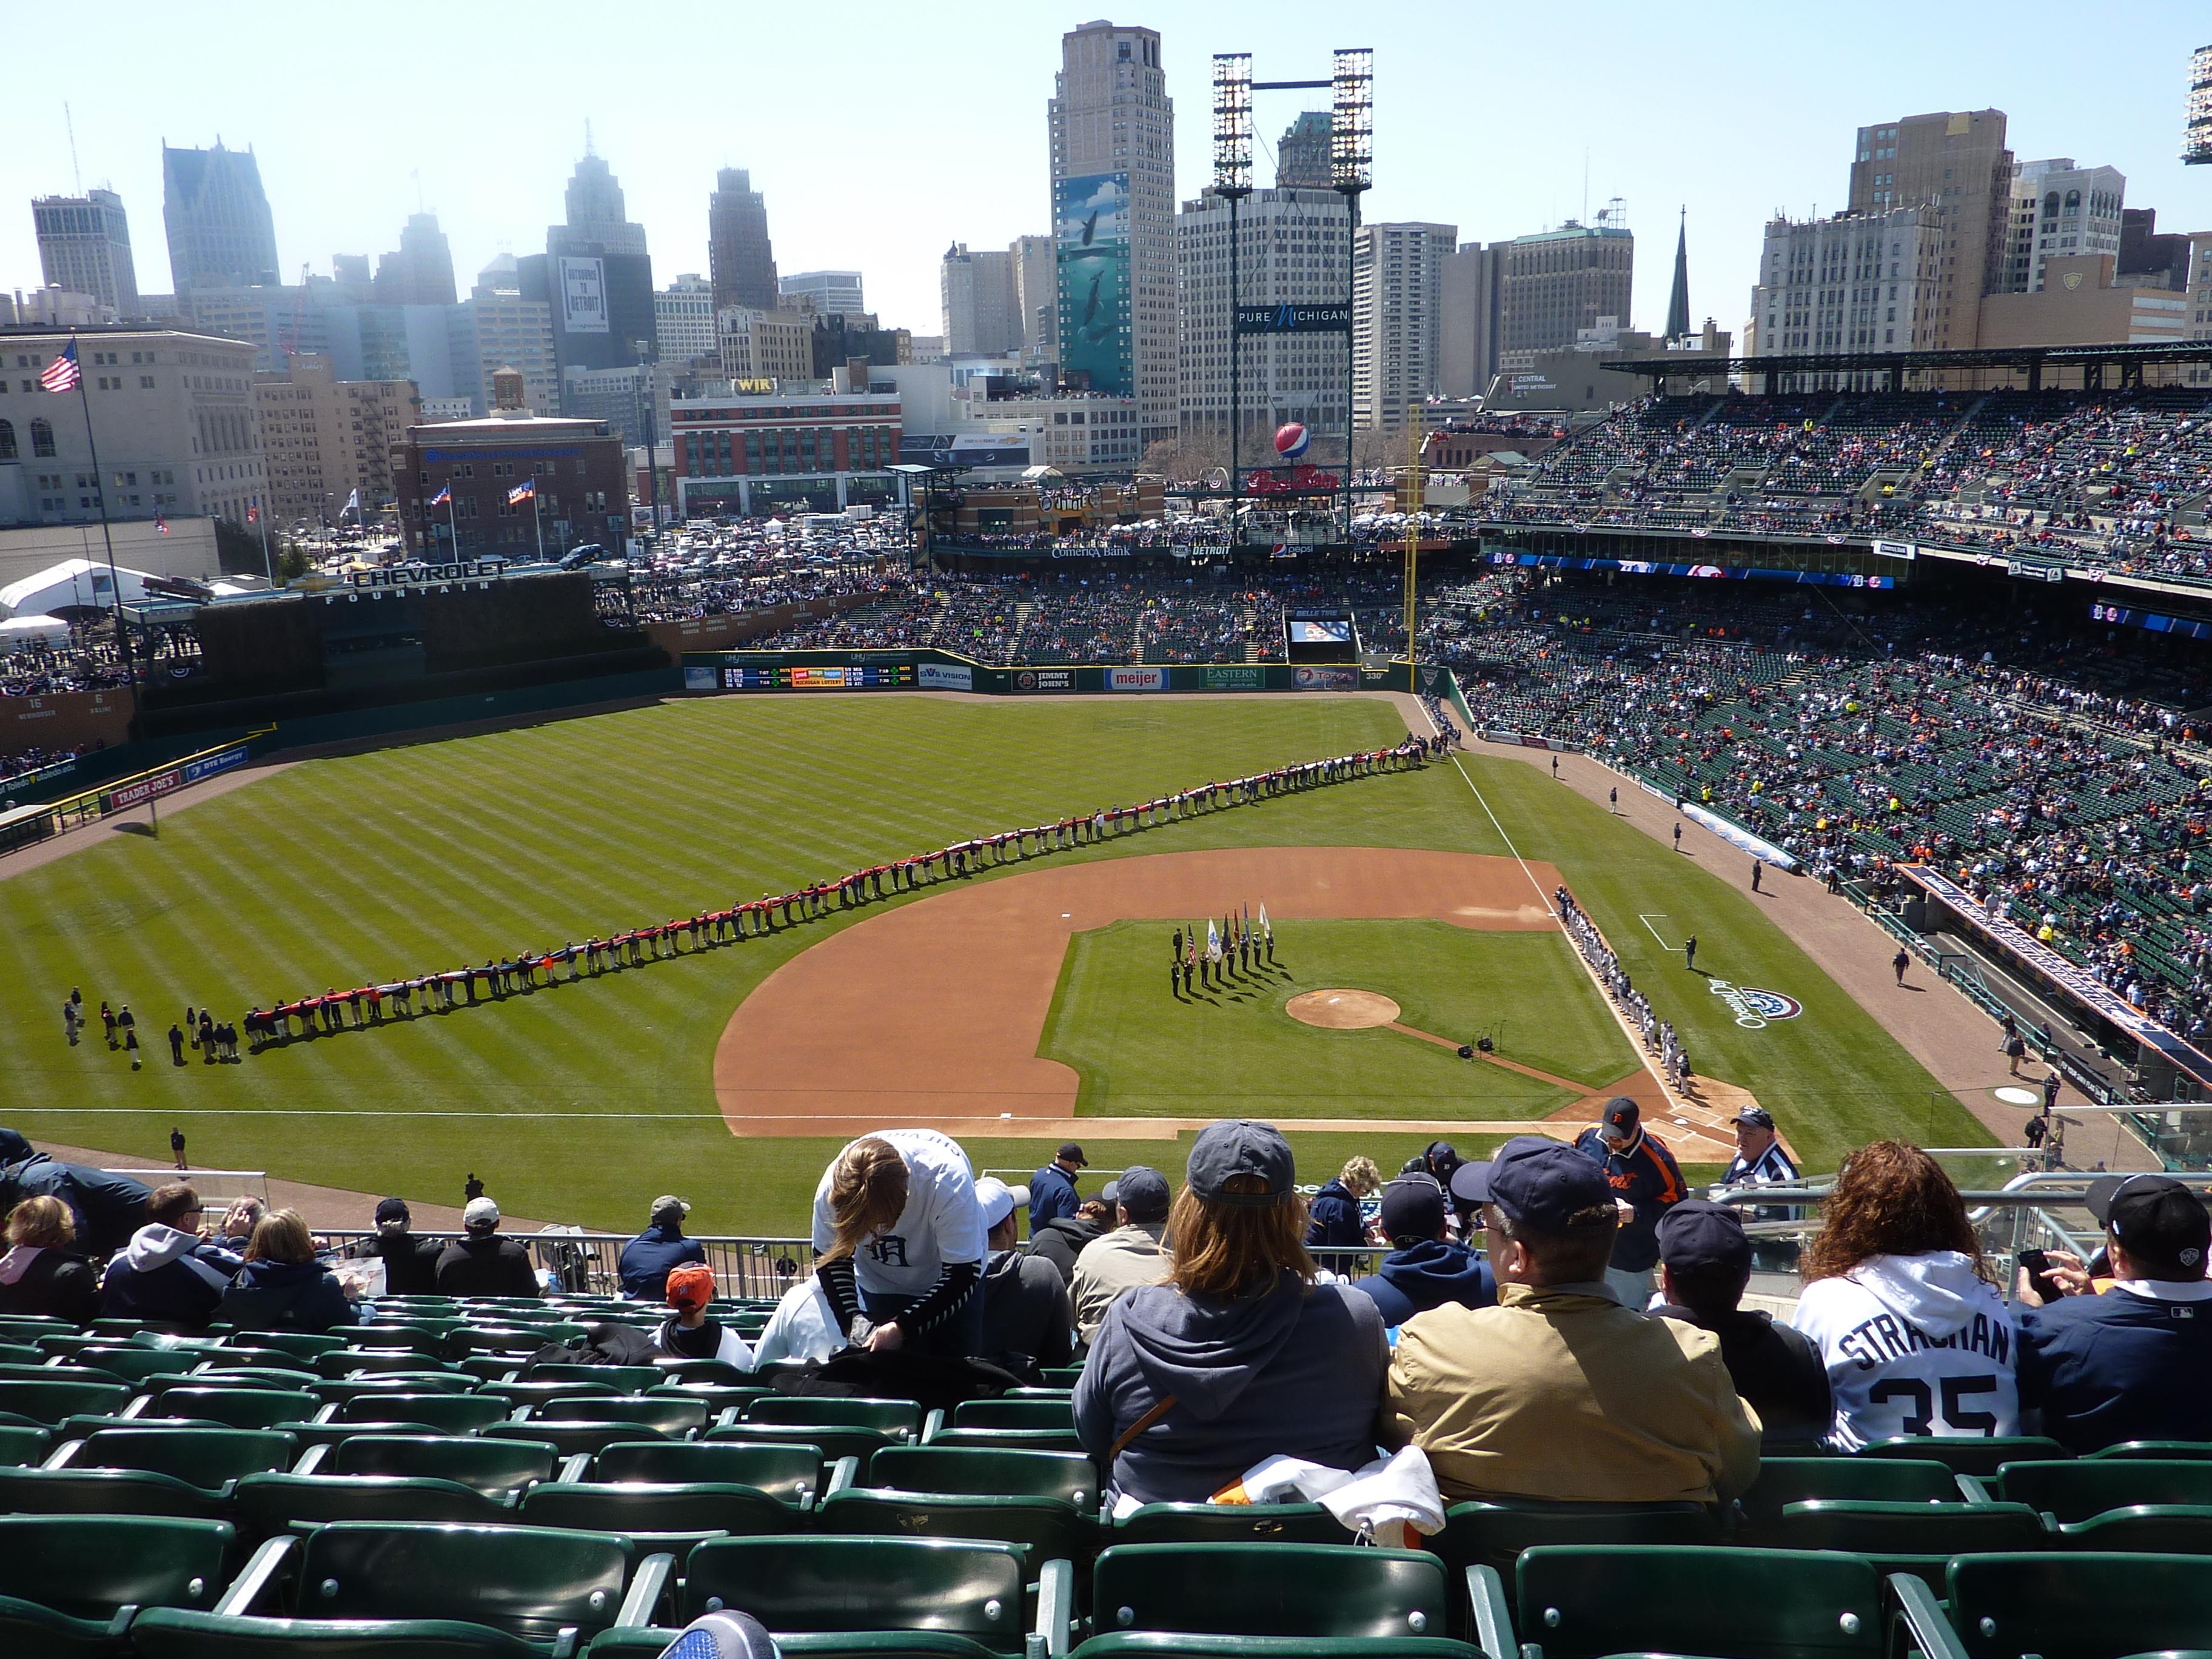 Tiger's Stadium, opening day 2013